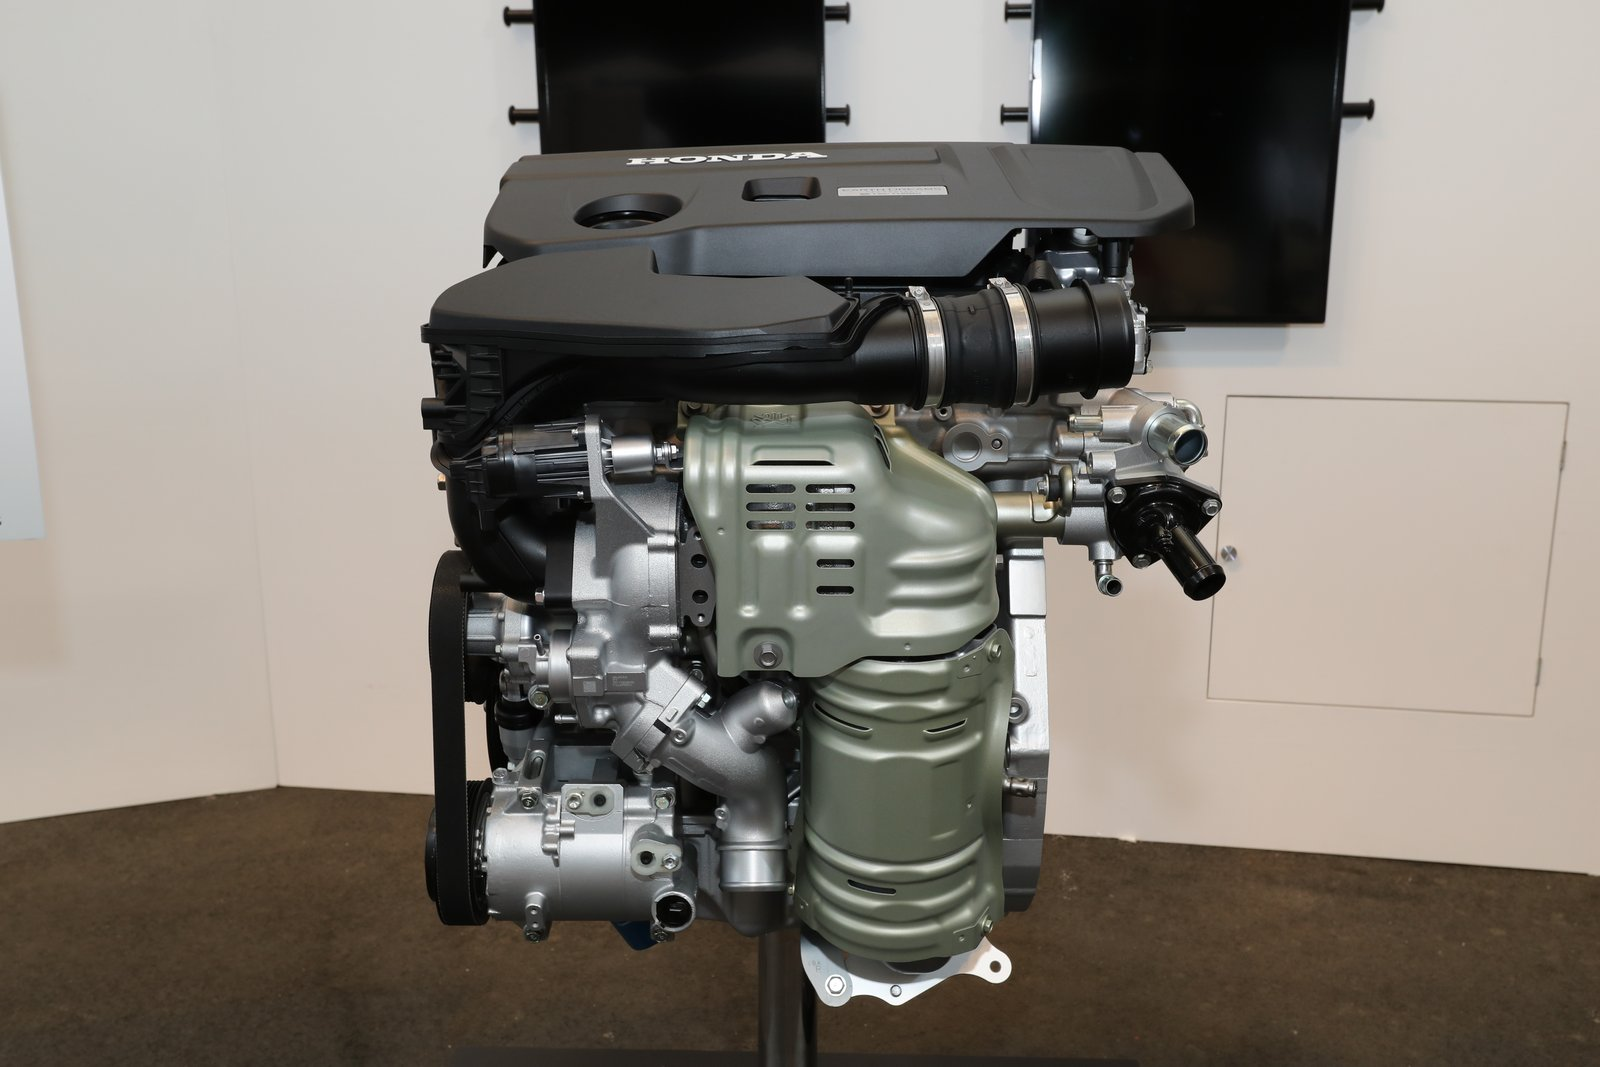 2018 Honda Accord Getting 1 5l And 2 0l Turbo Engines 10 Sd Auto